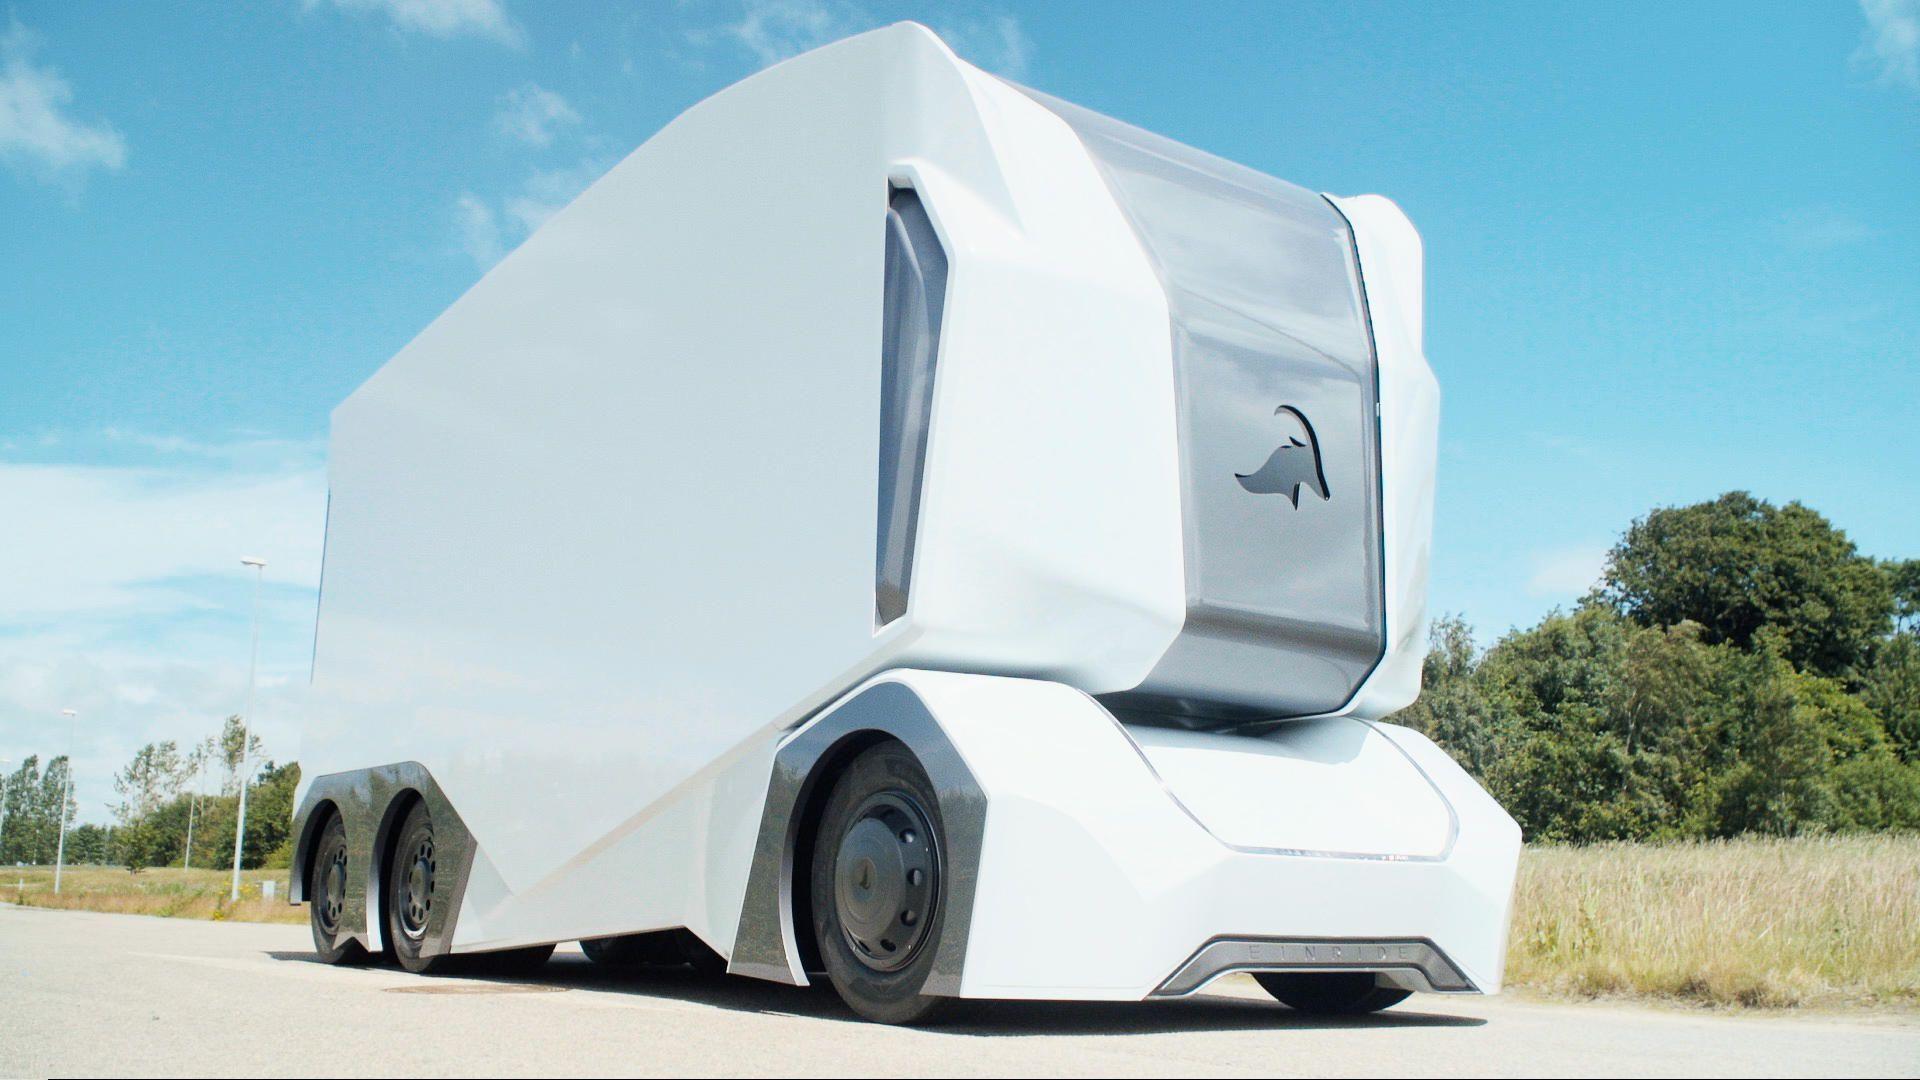 einride-self-driving-truck-prototype-3.jpg